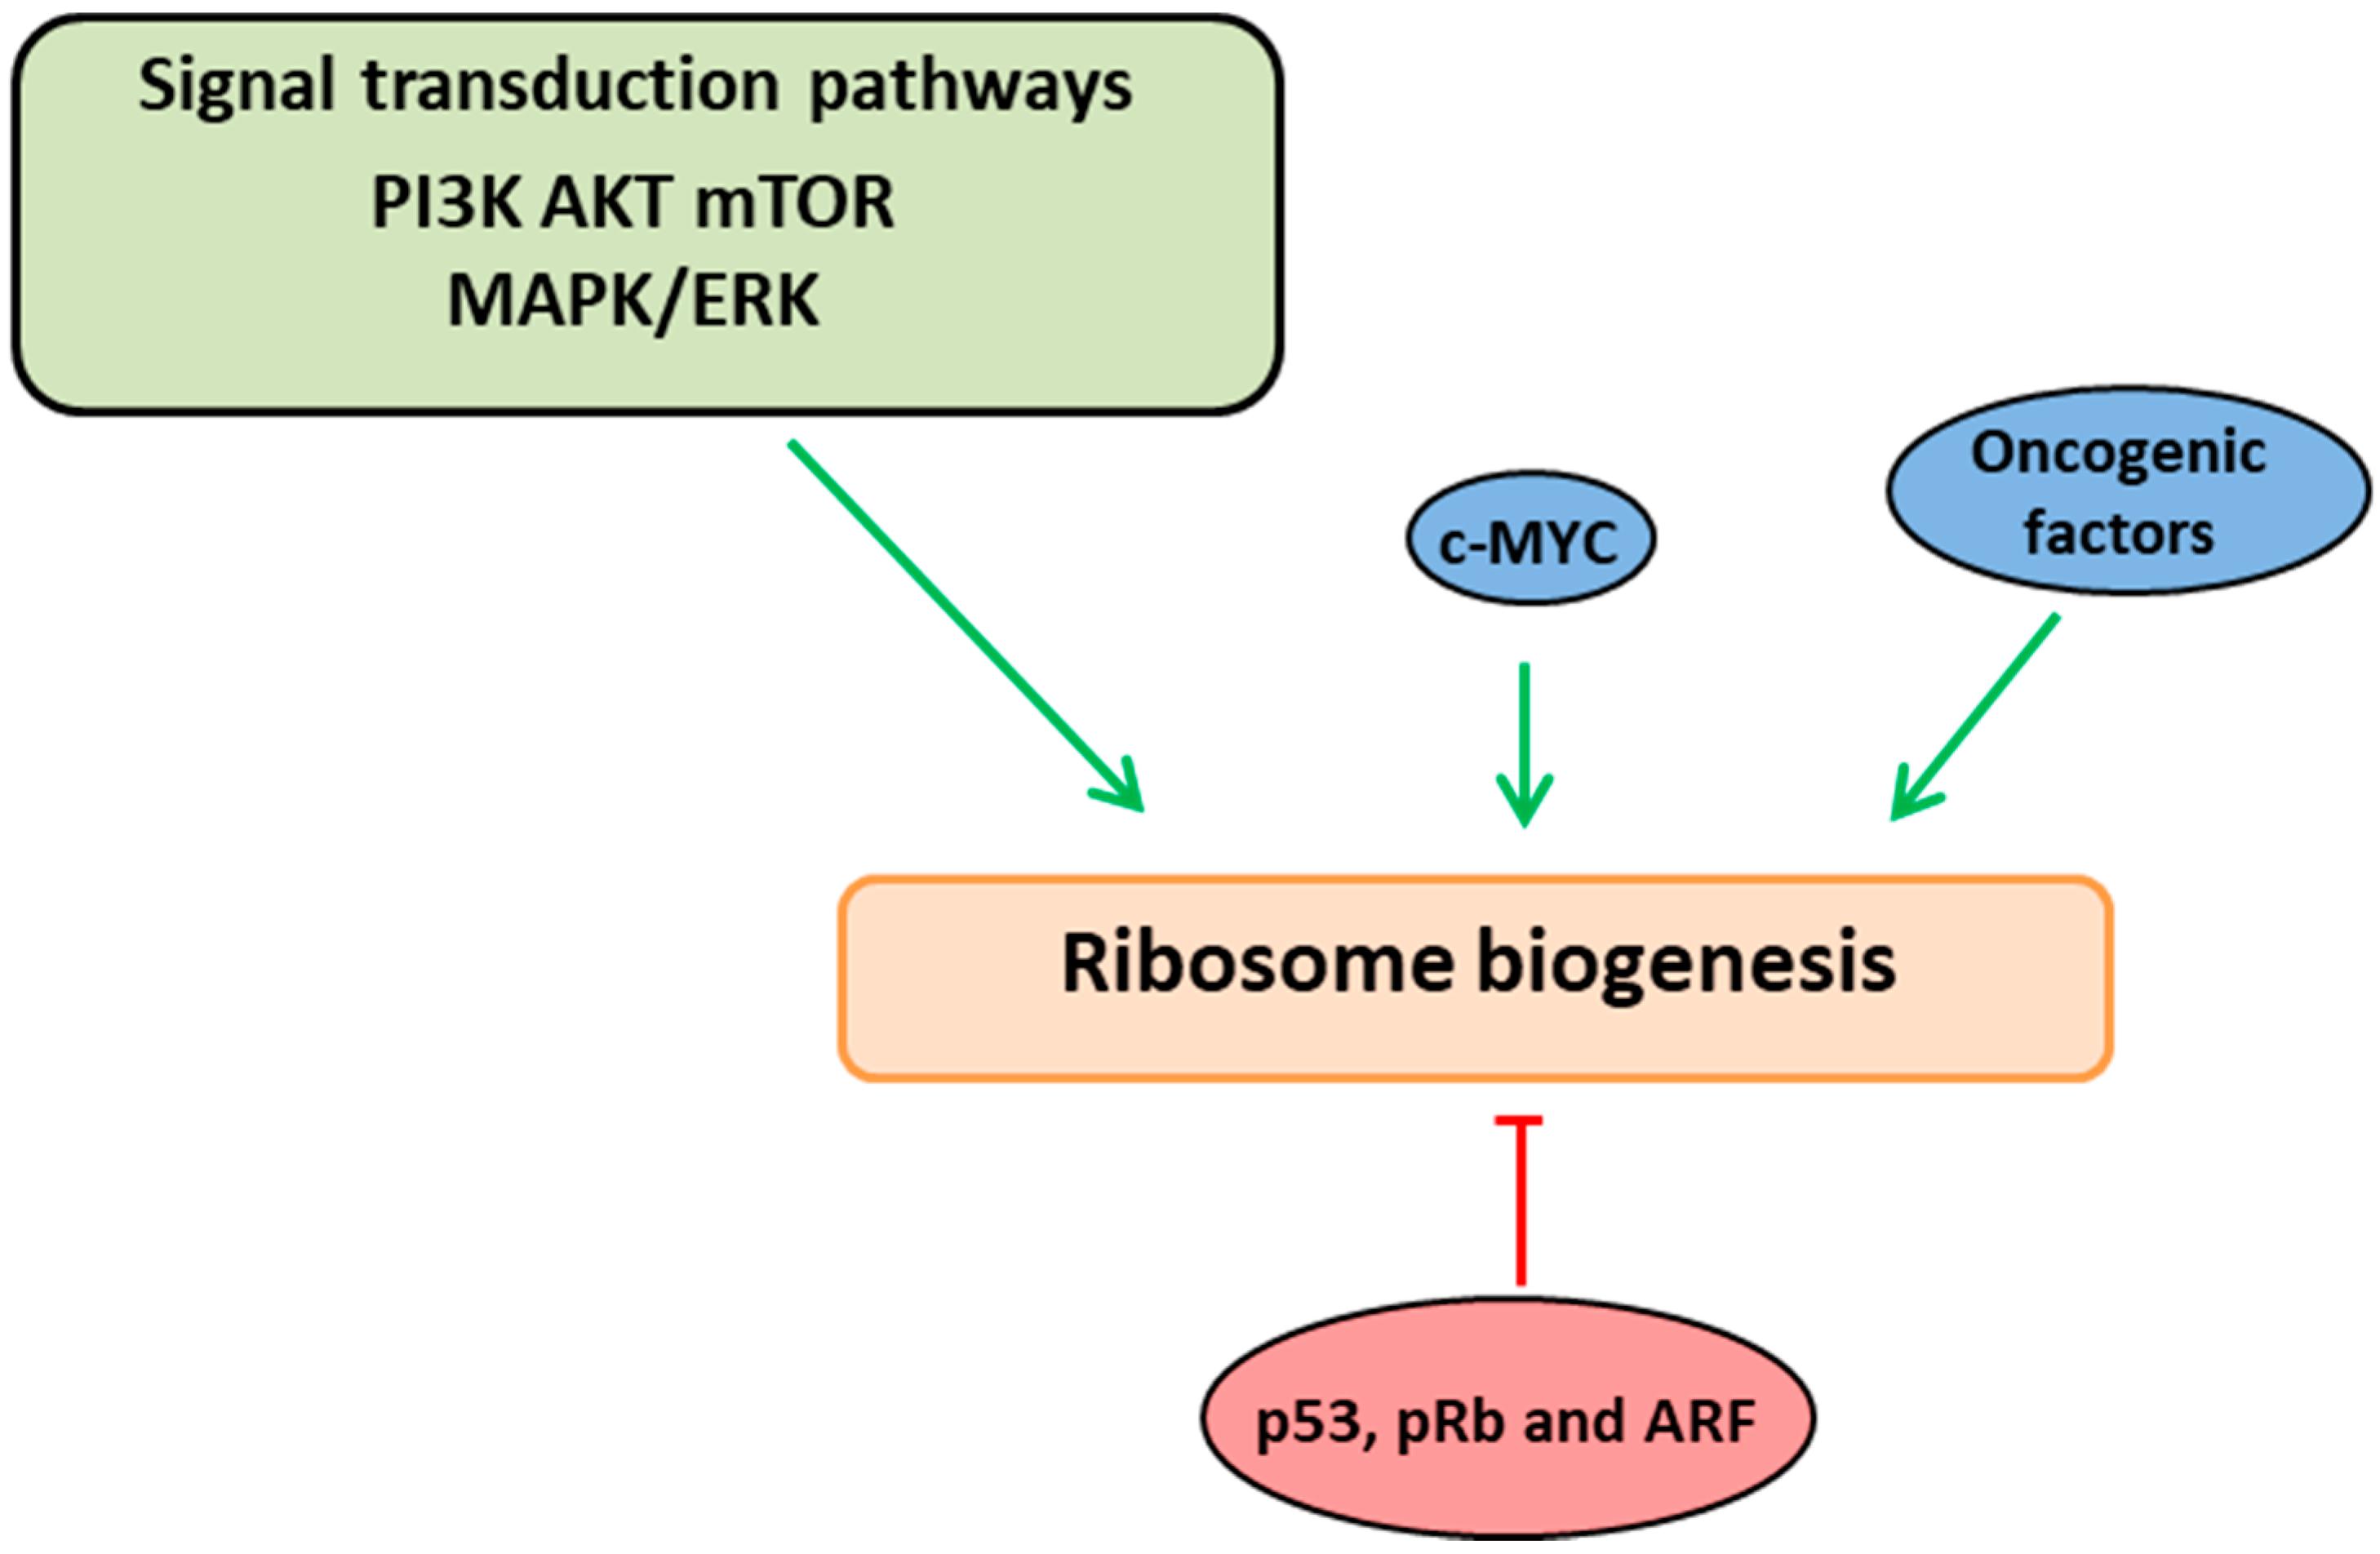 ijms 19 03757 g001 ijms free full text translation stress regulates ribosome